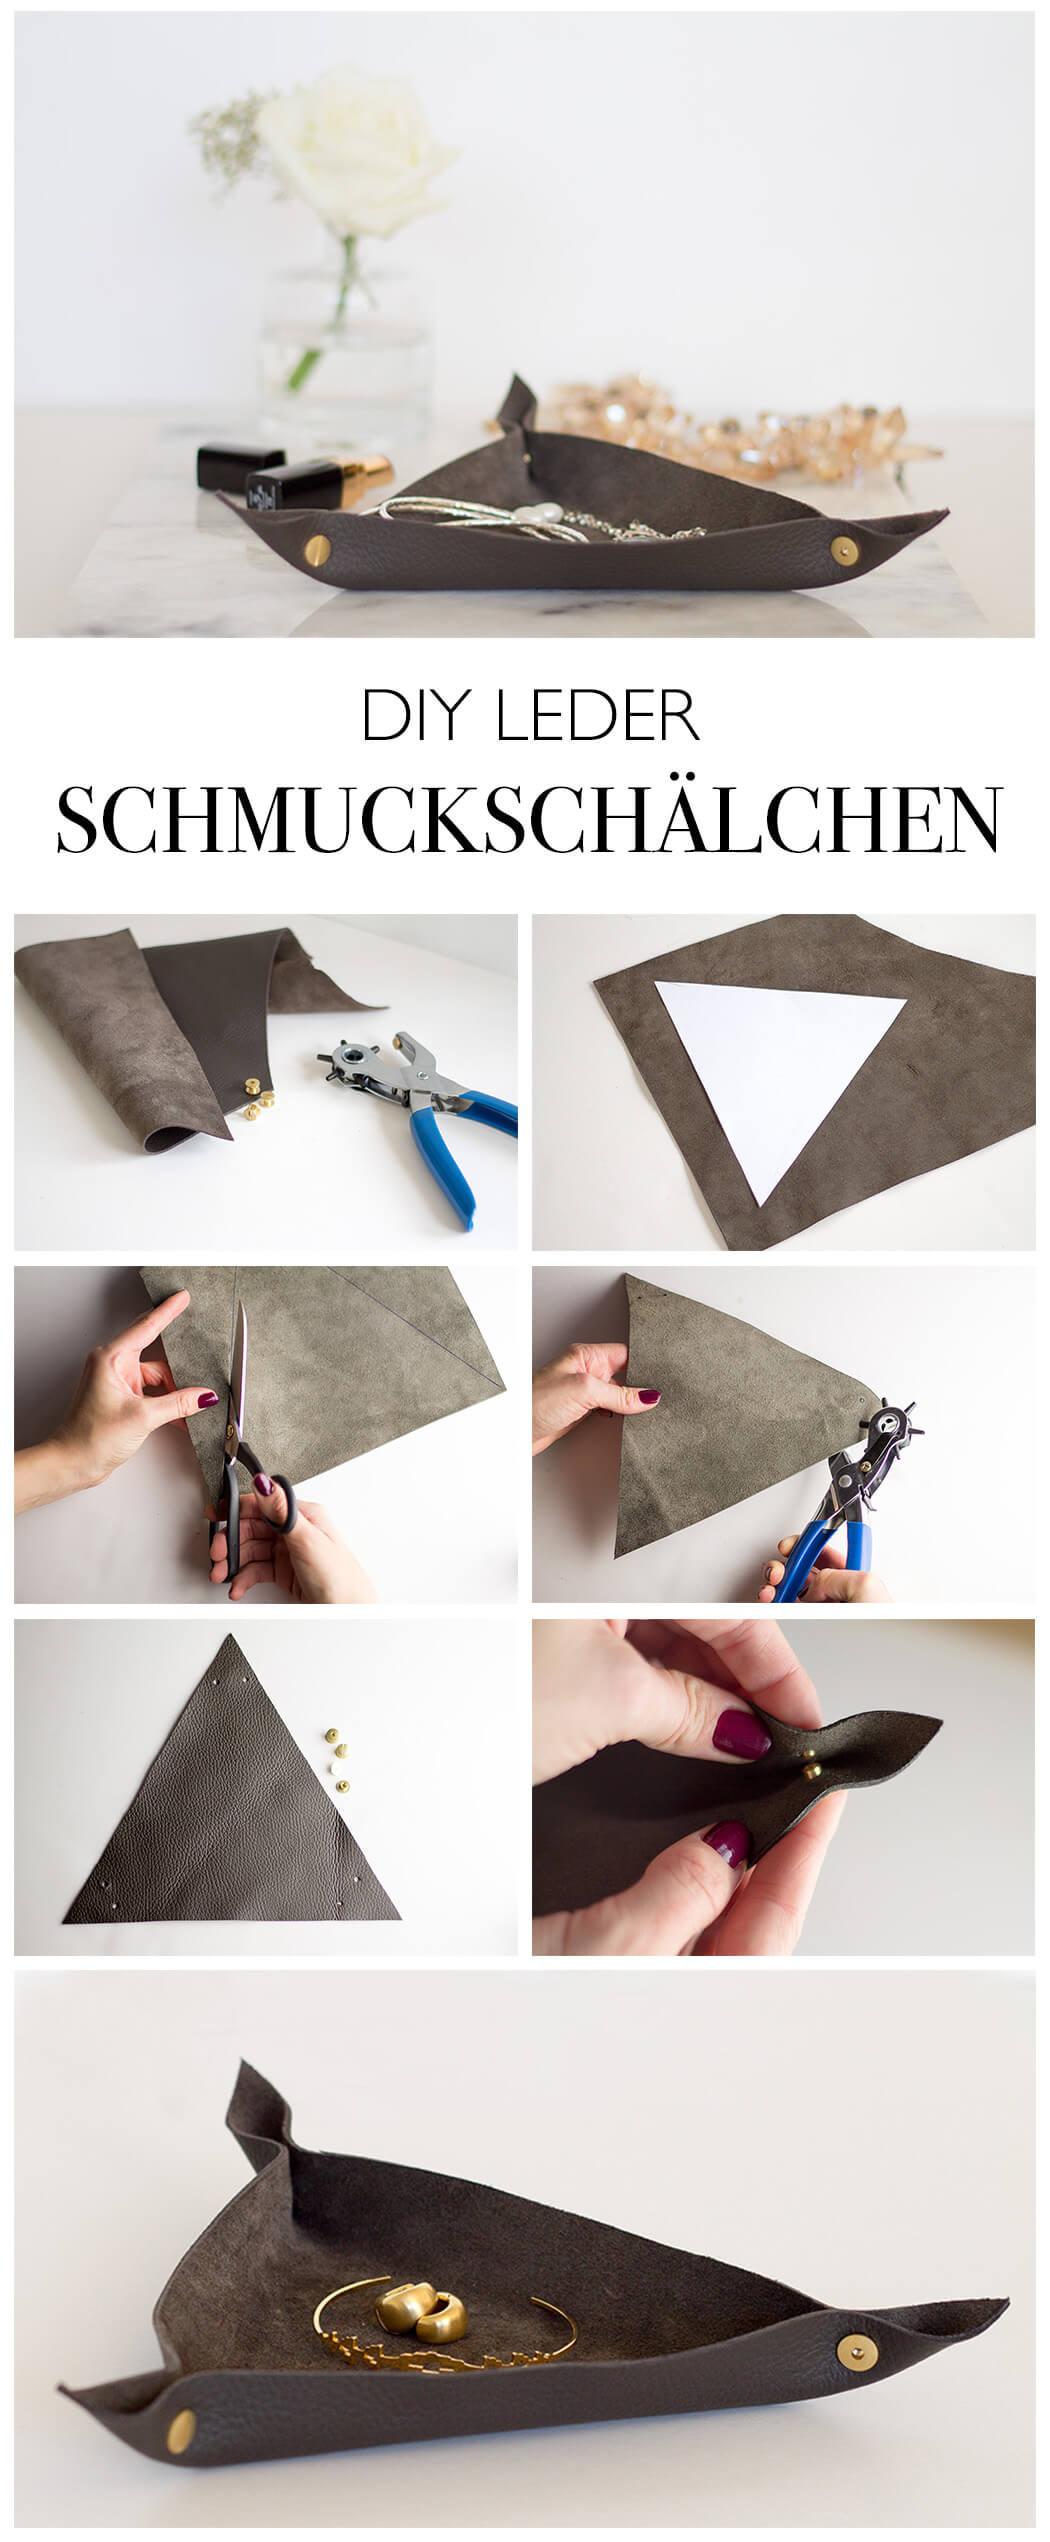 DIY LEDER SCHMUCK SCHALE